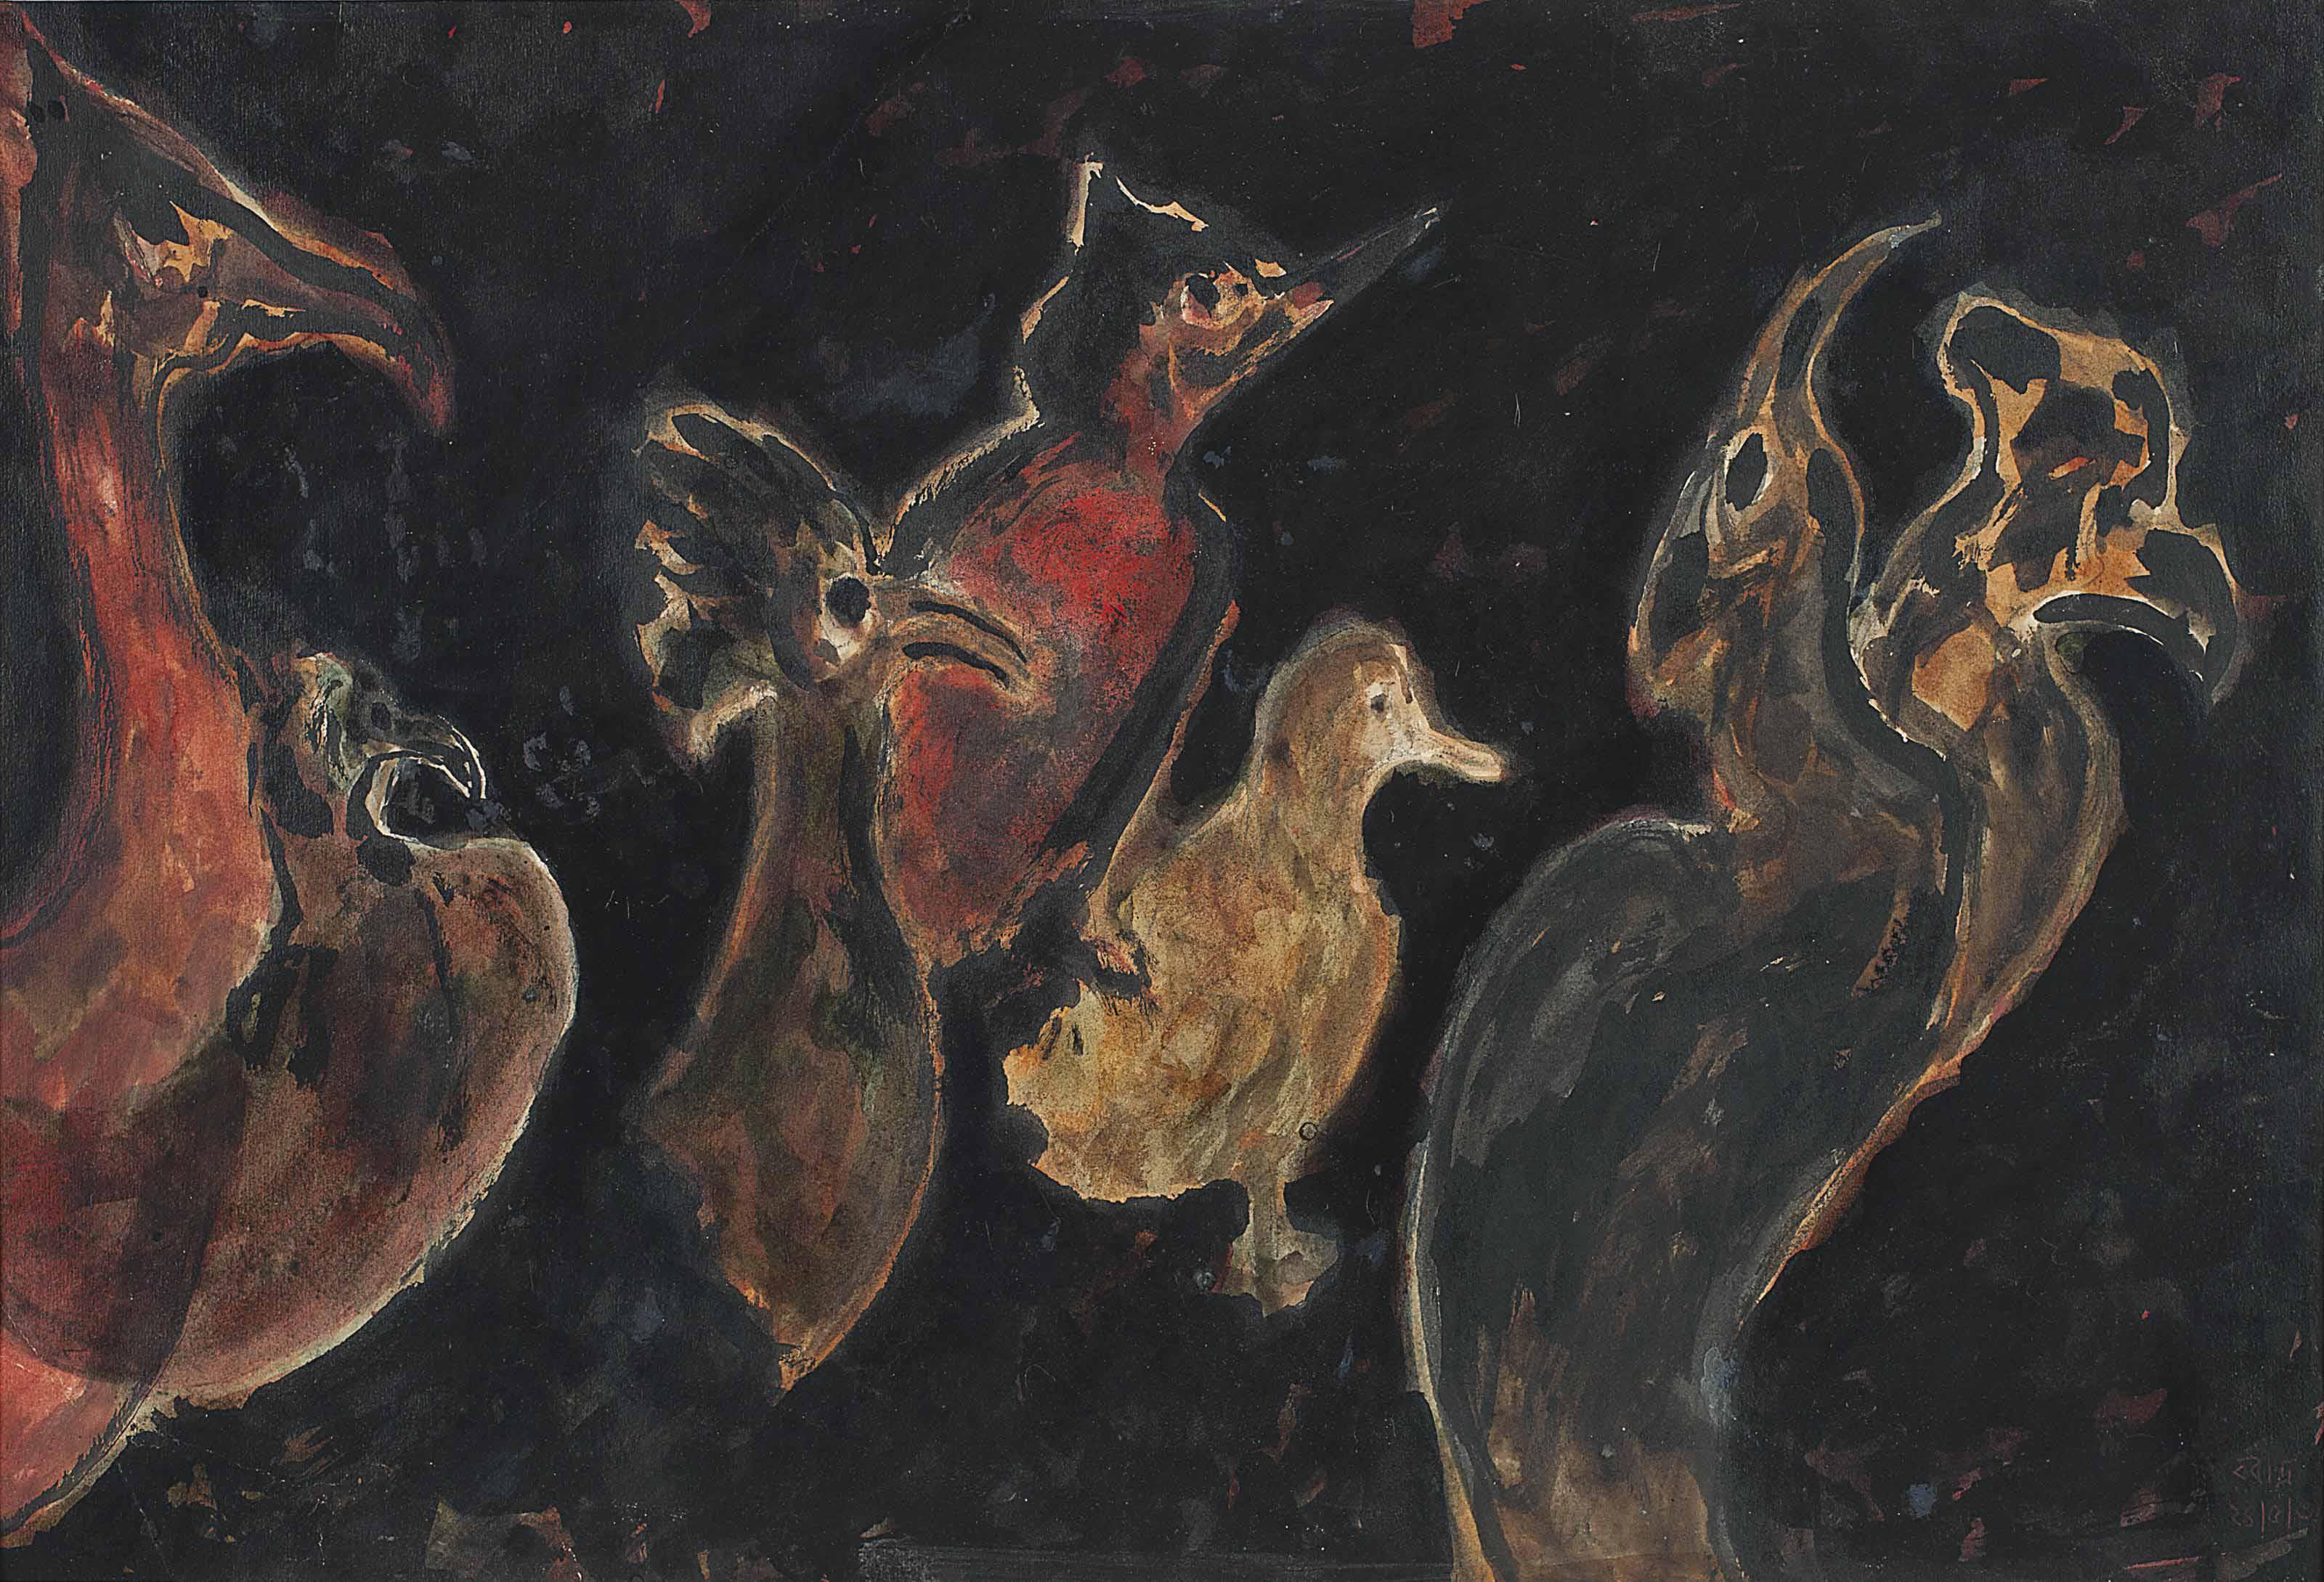 MEERA MUKHERJEE (1923 - 1998)